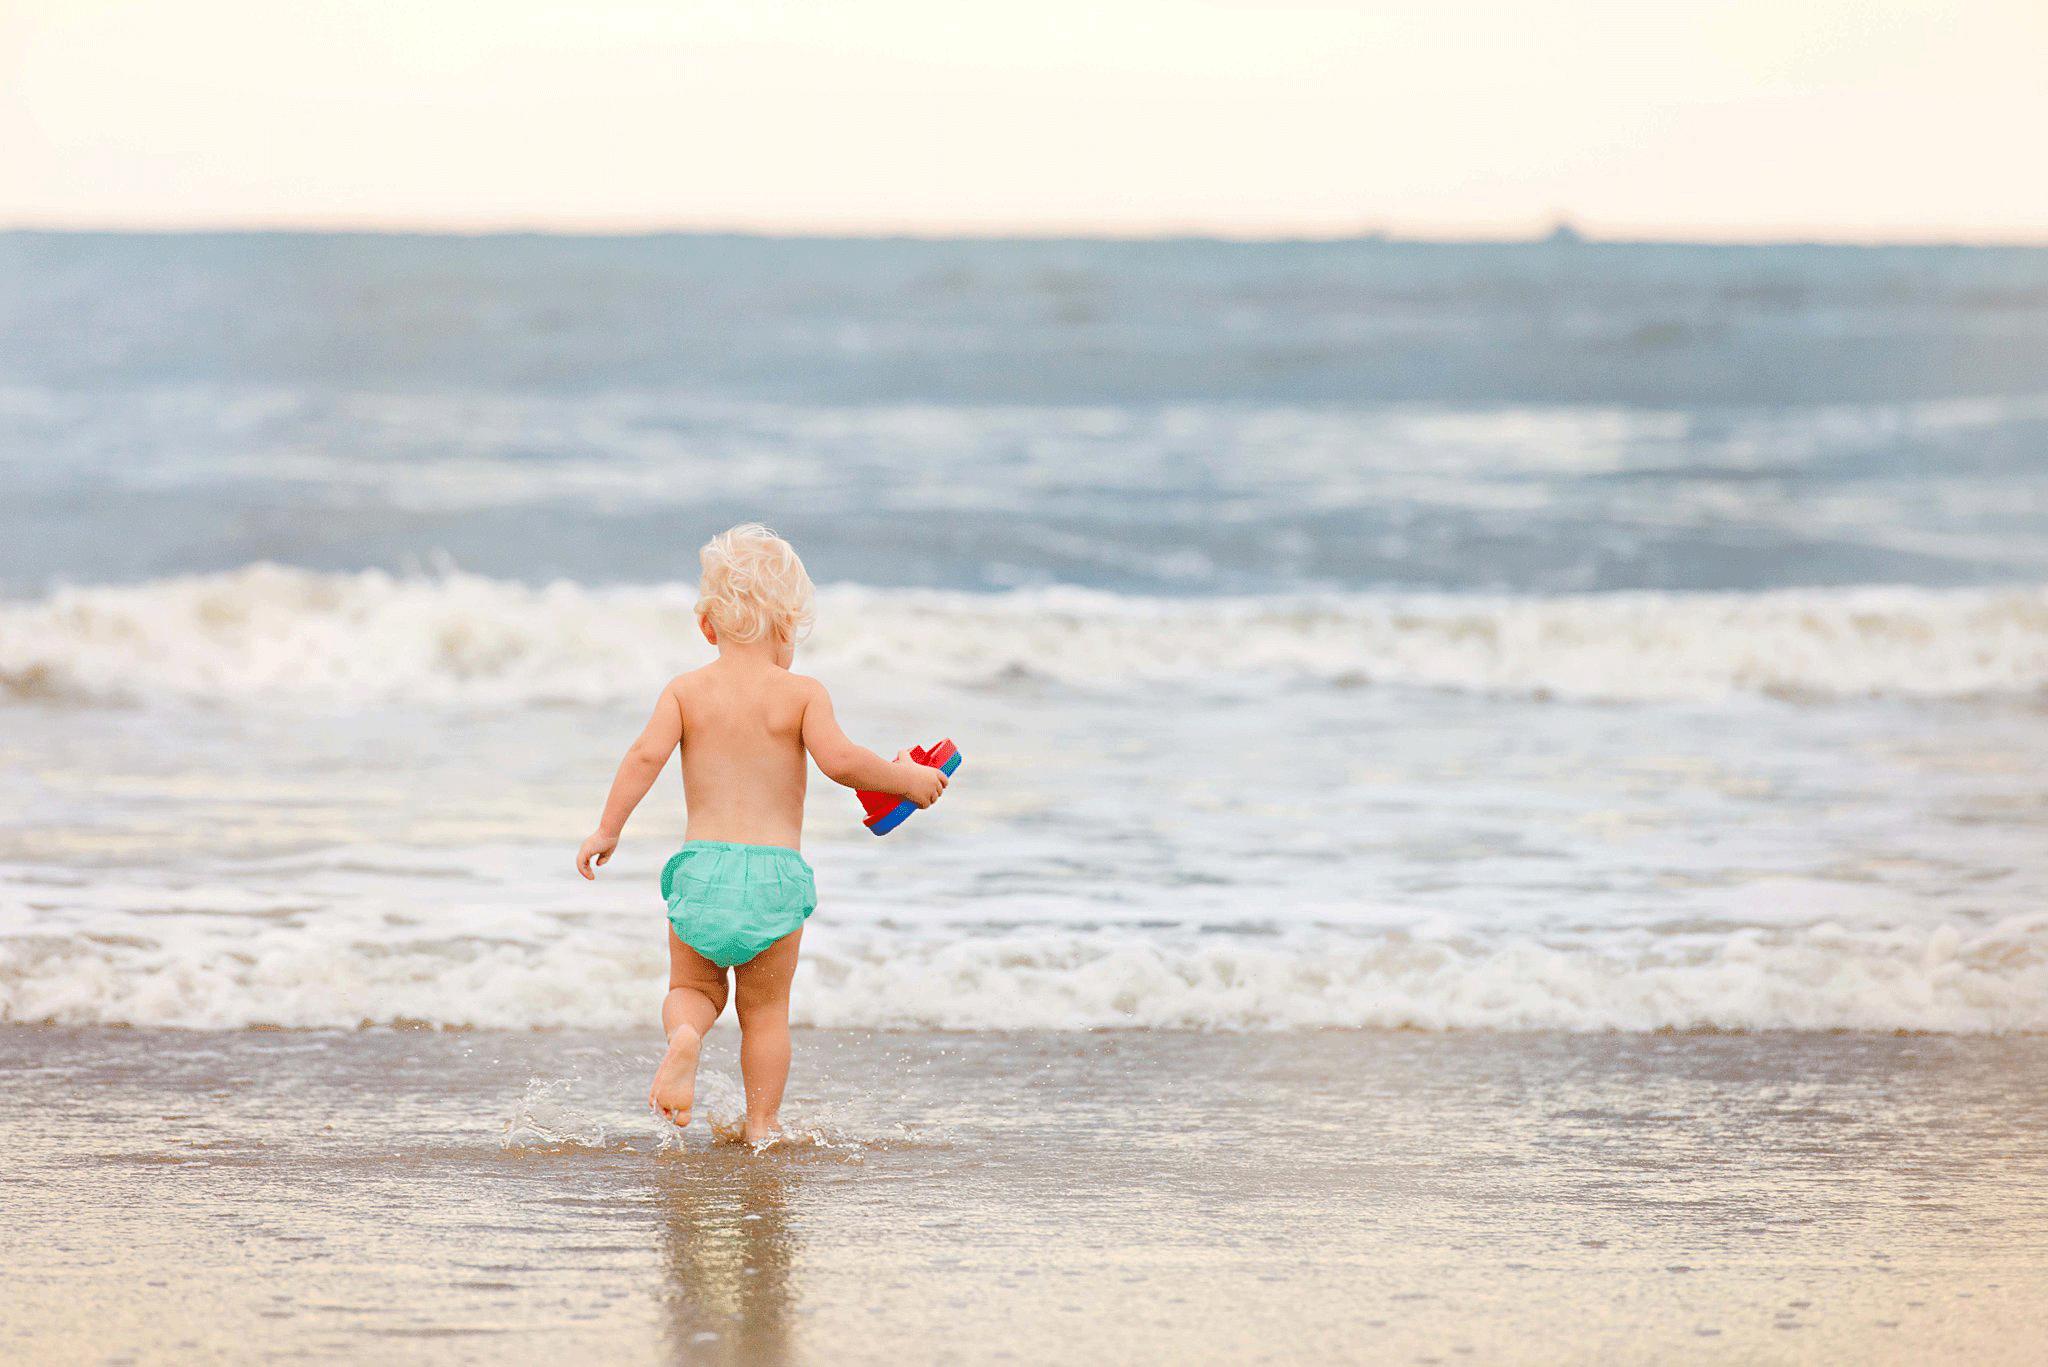 toddler-on-the-beach-virginia-beach-lifestyle-photography-sandbridge-photographers-melissa-bliss-photography-family-photos.png